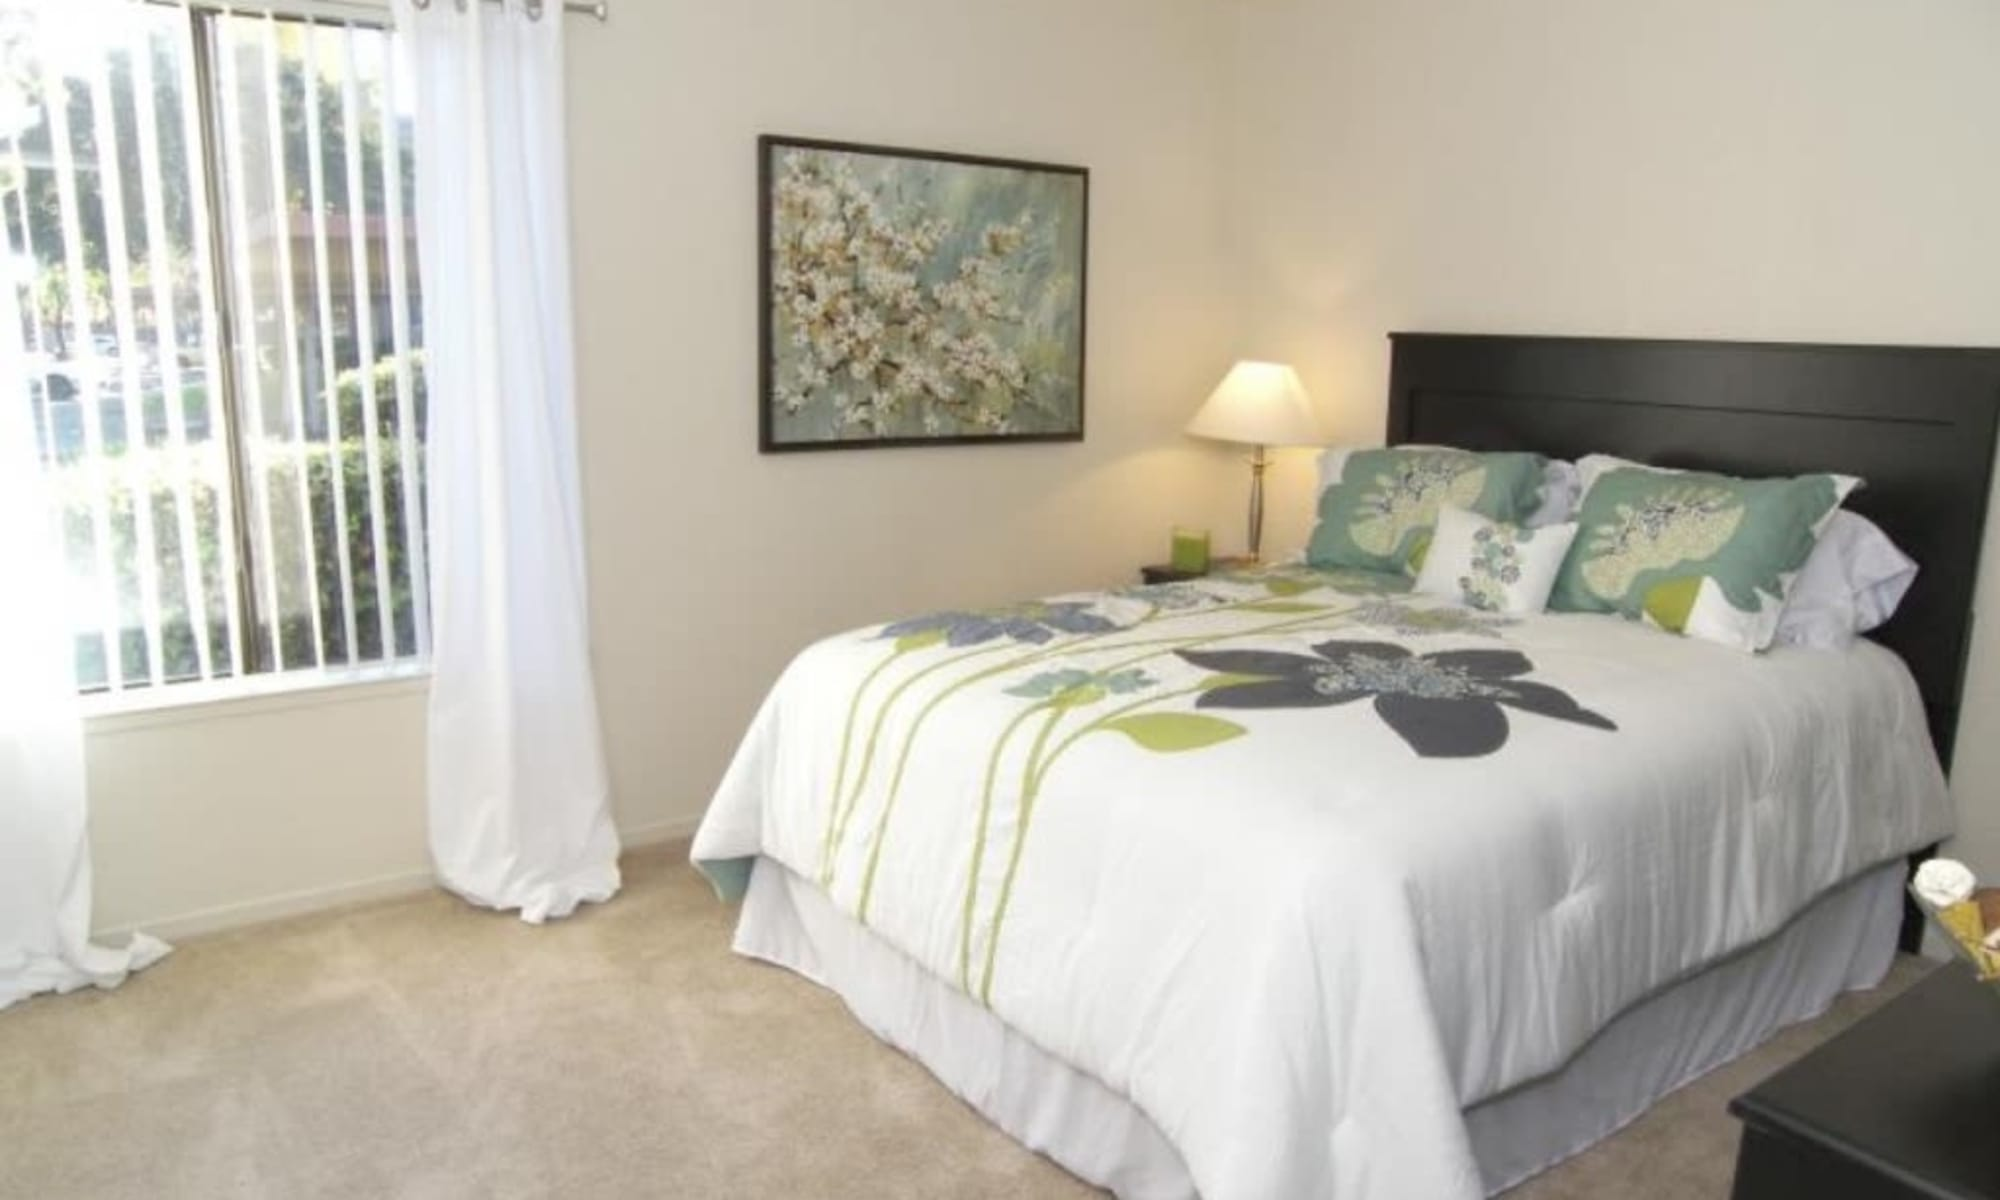 Apartments in Stockton, CA